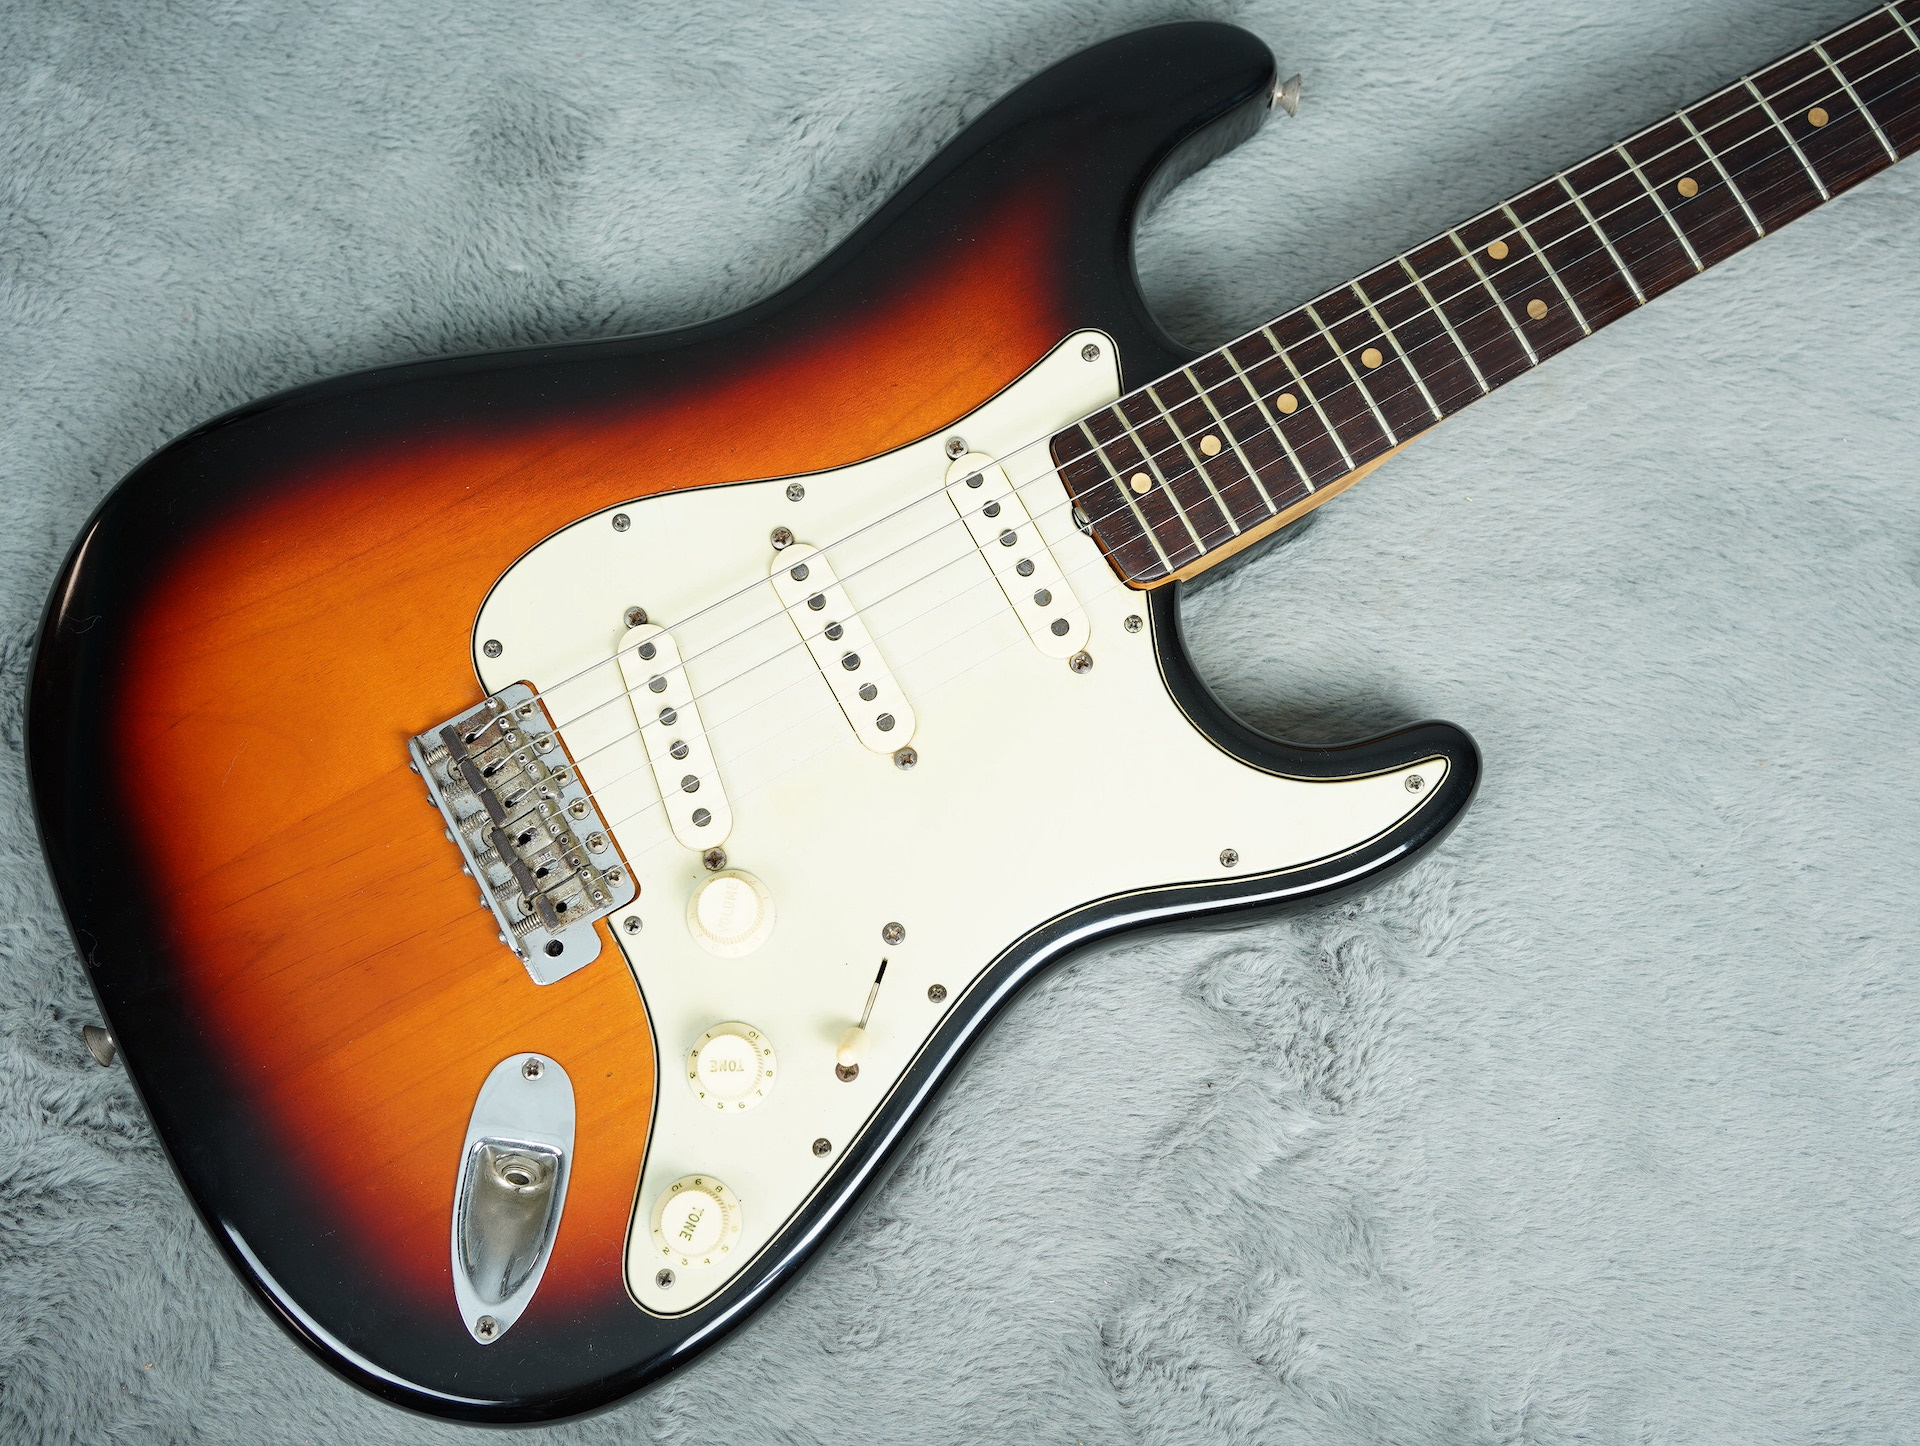 1964 Fender Stratocaster body only refin + HSC